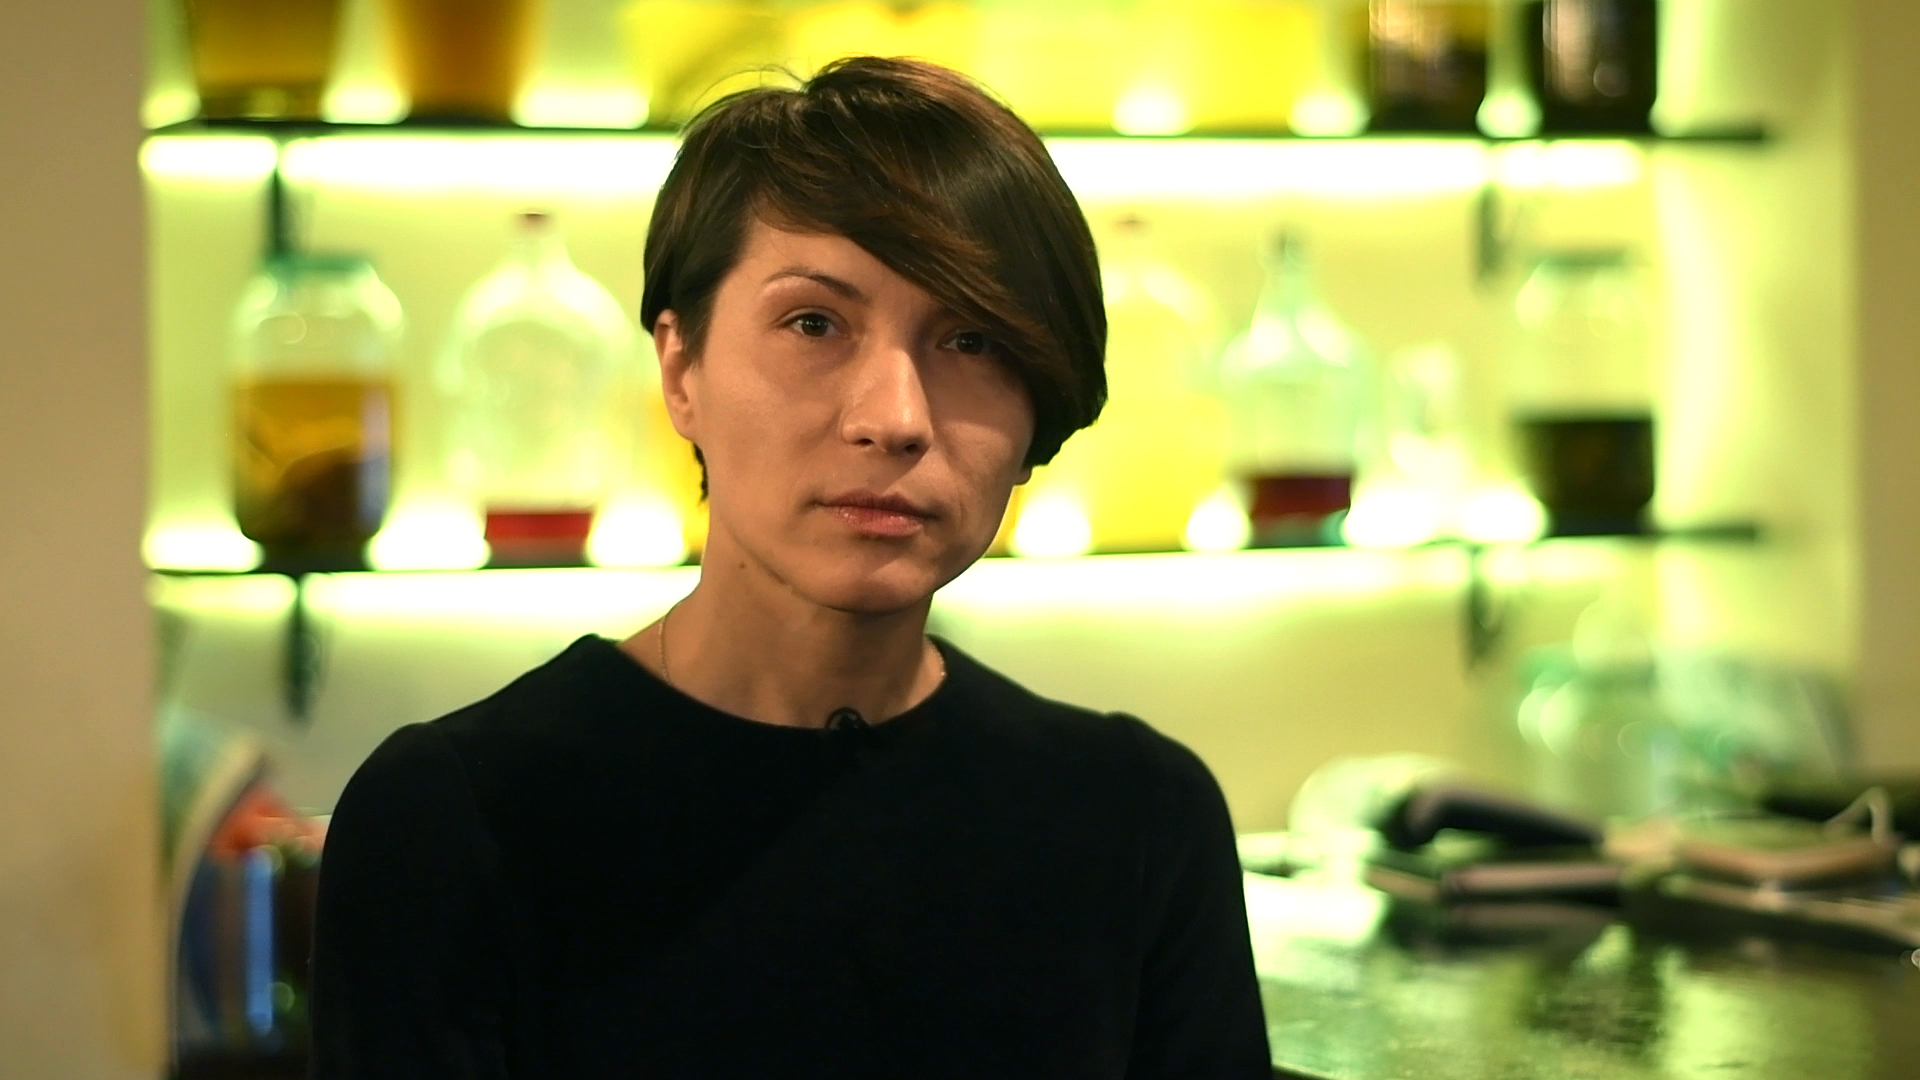 poliakova0 #TalkShot featured, TED Talks, TEDx Sadovoe Ring, Елена Полякова, ораторское искусство, сила слова